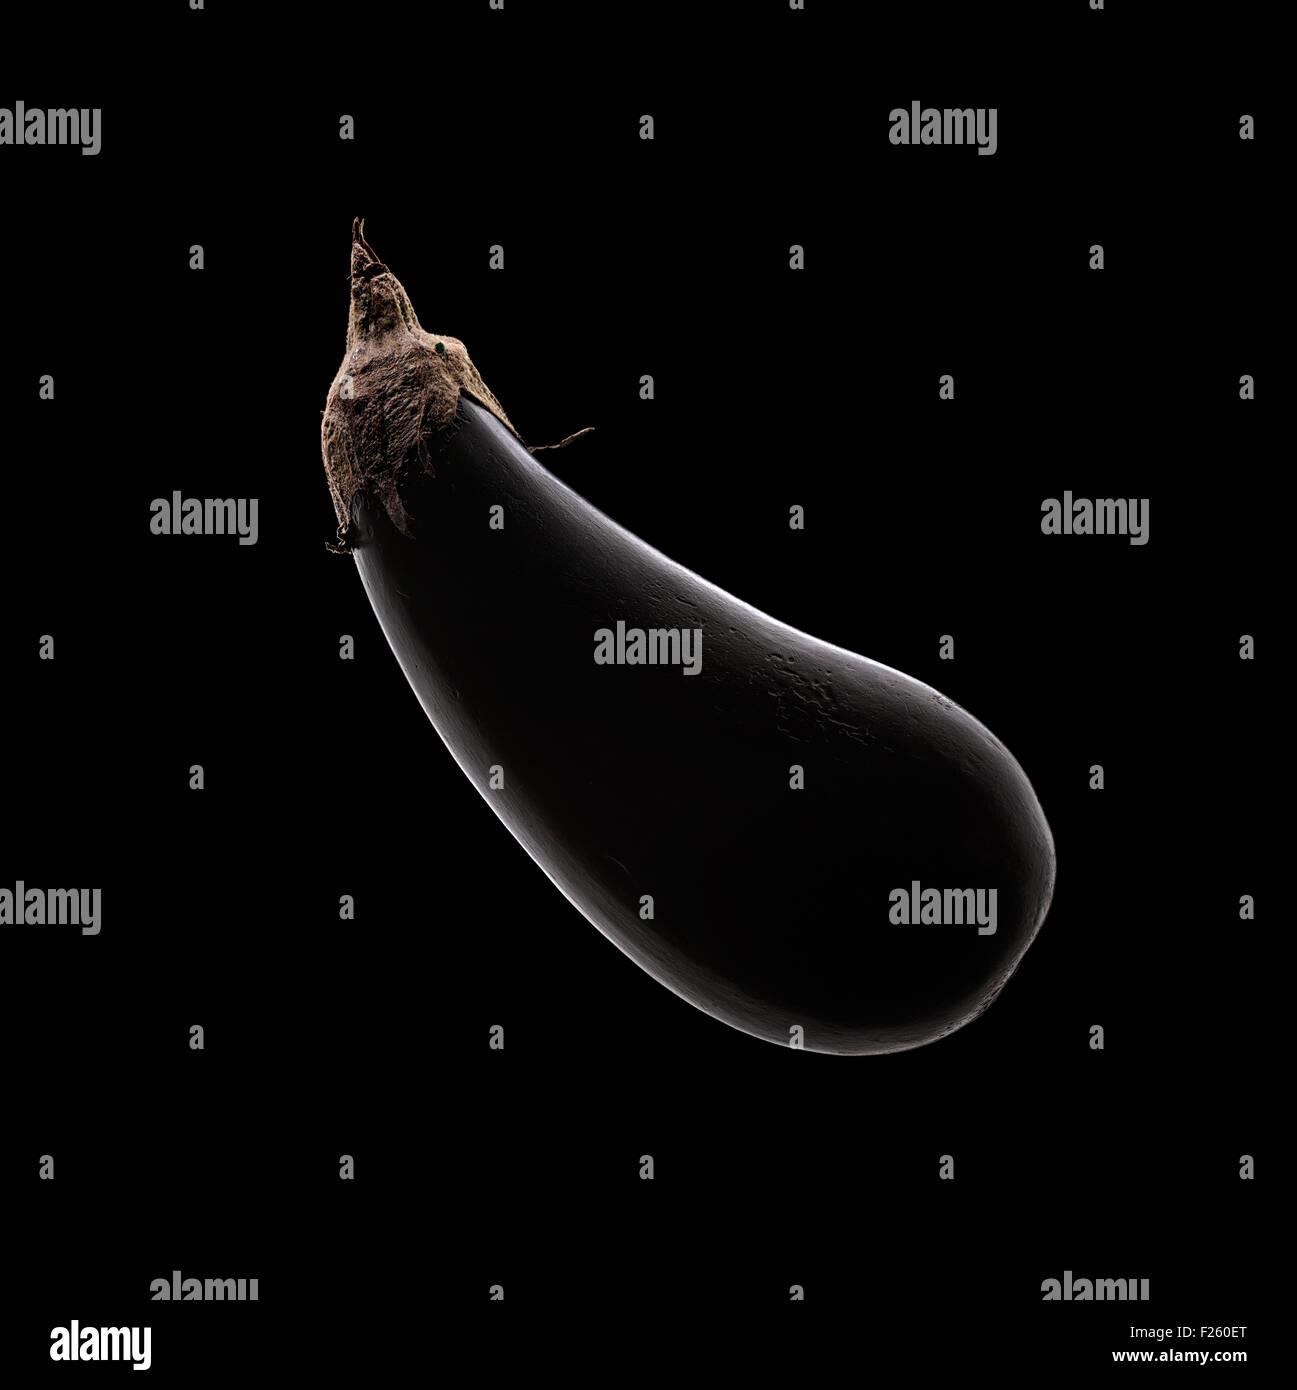 La berenjena (berenjenas) bodegón con rim luz sobre fondo negro desde arriba Imagen De Stock